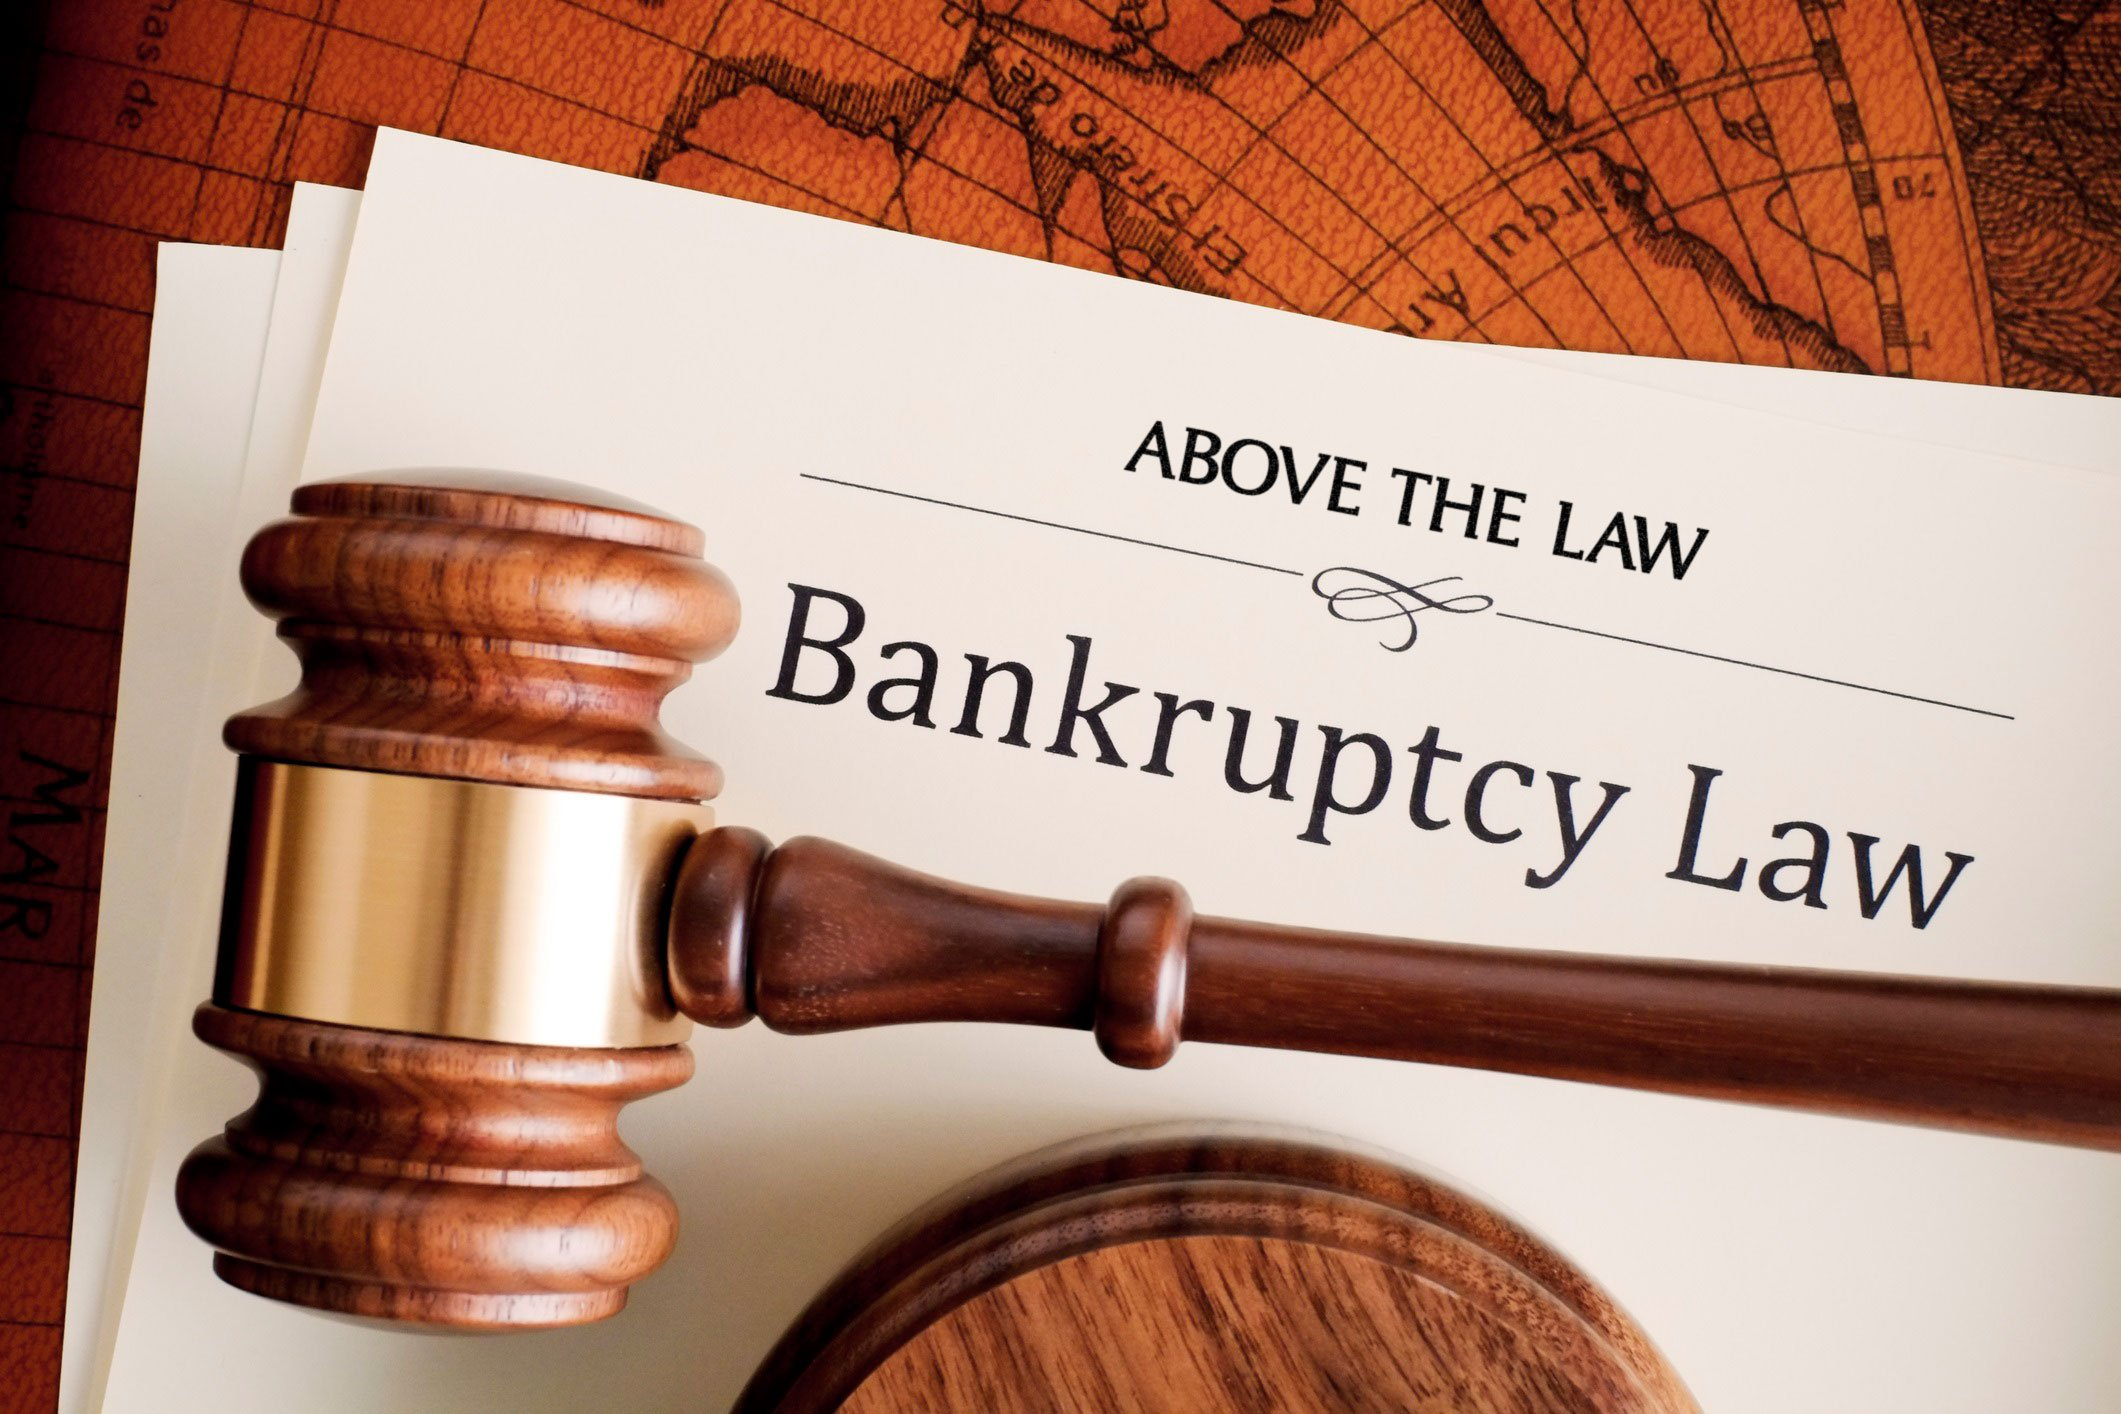 atl-bankruptcy-law-jumbo-1.jpg